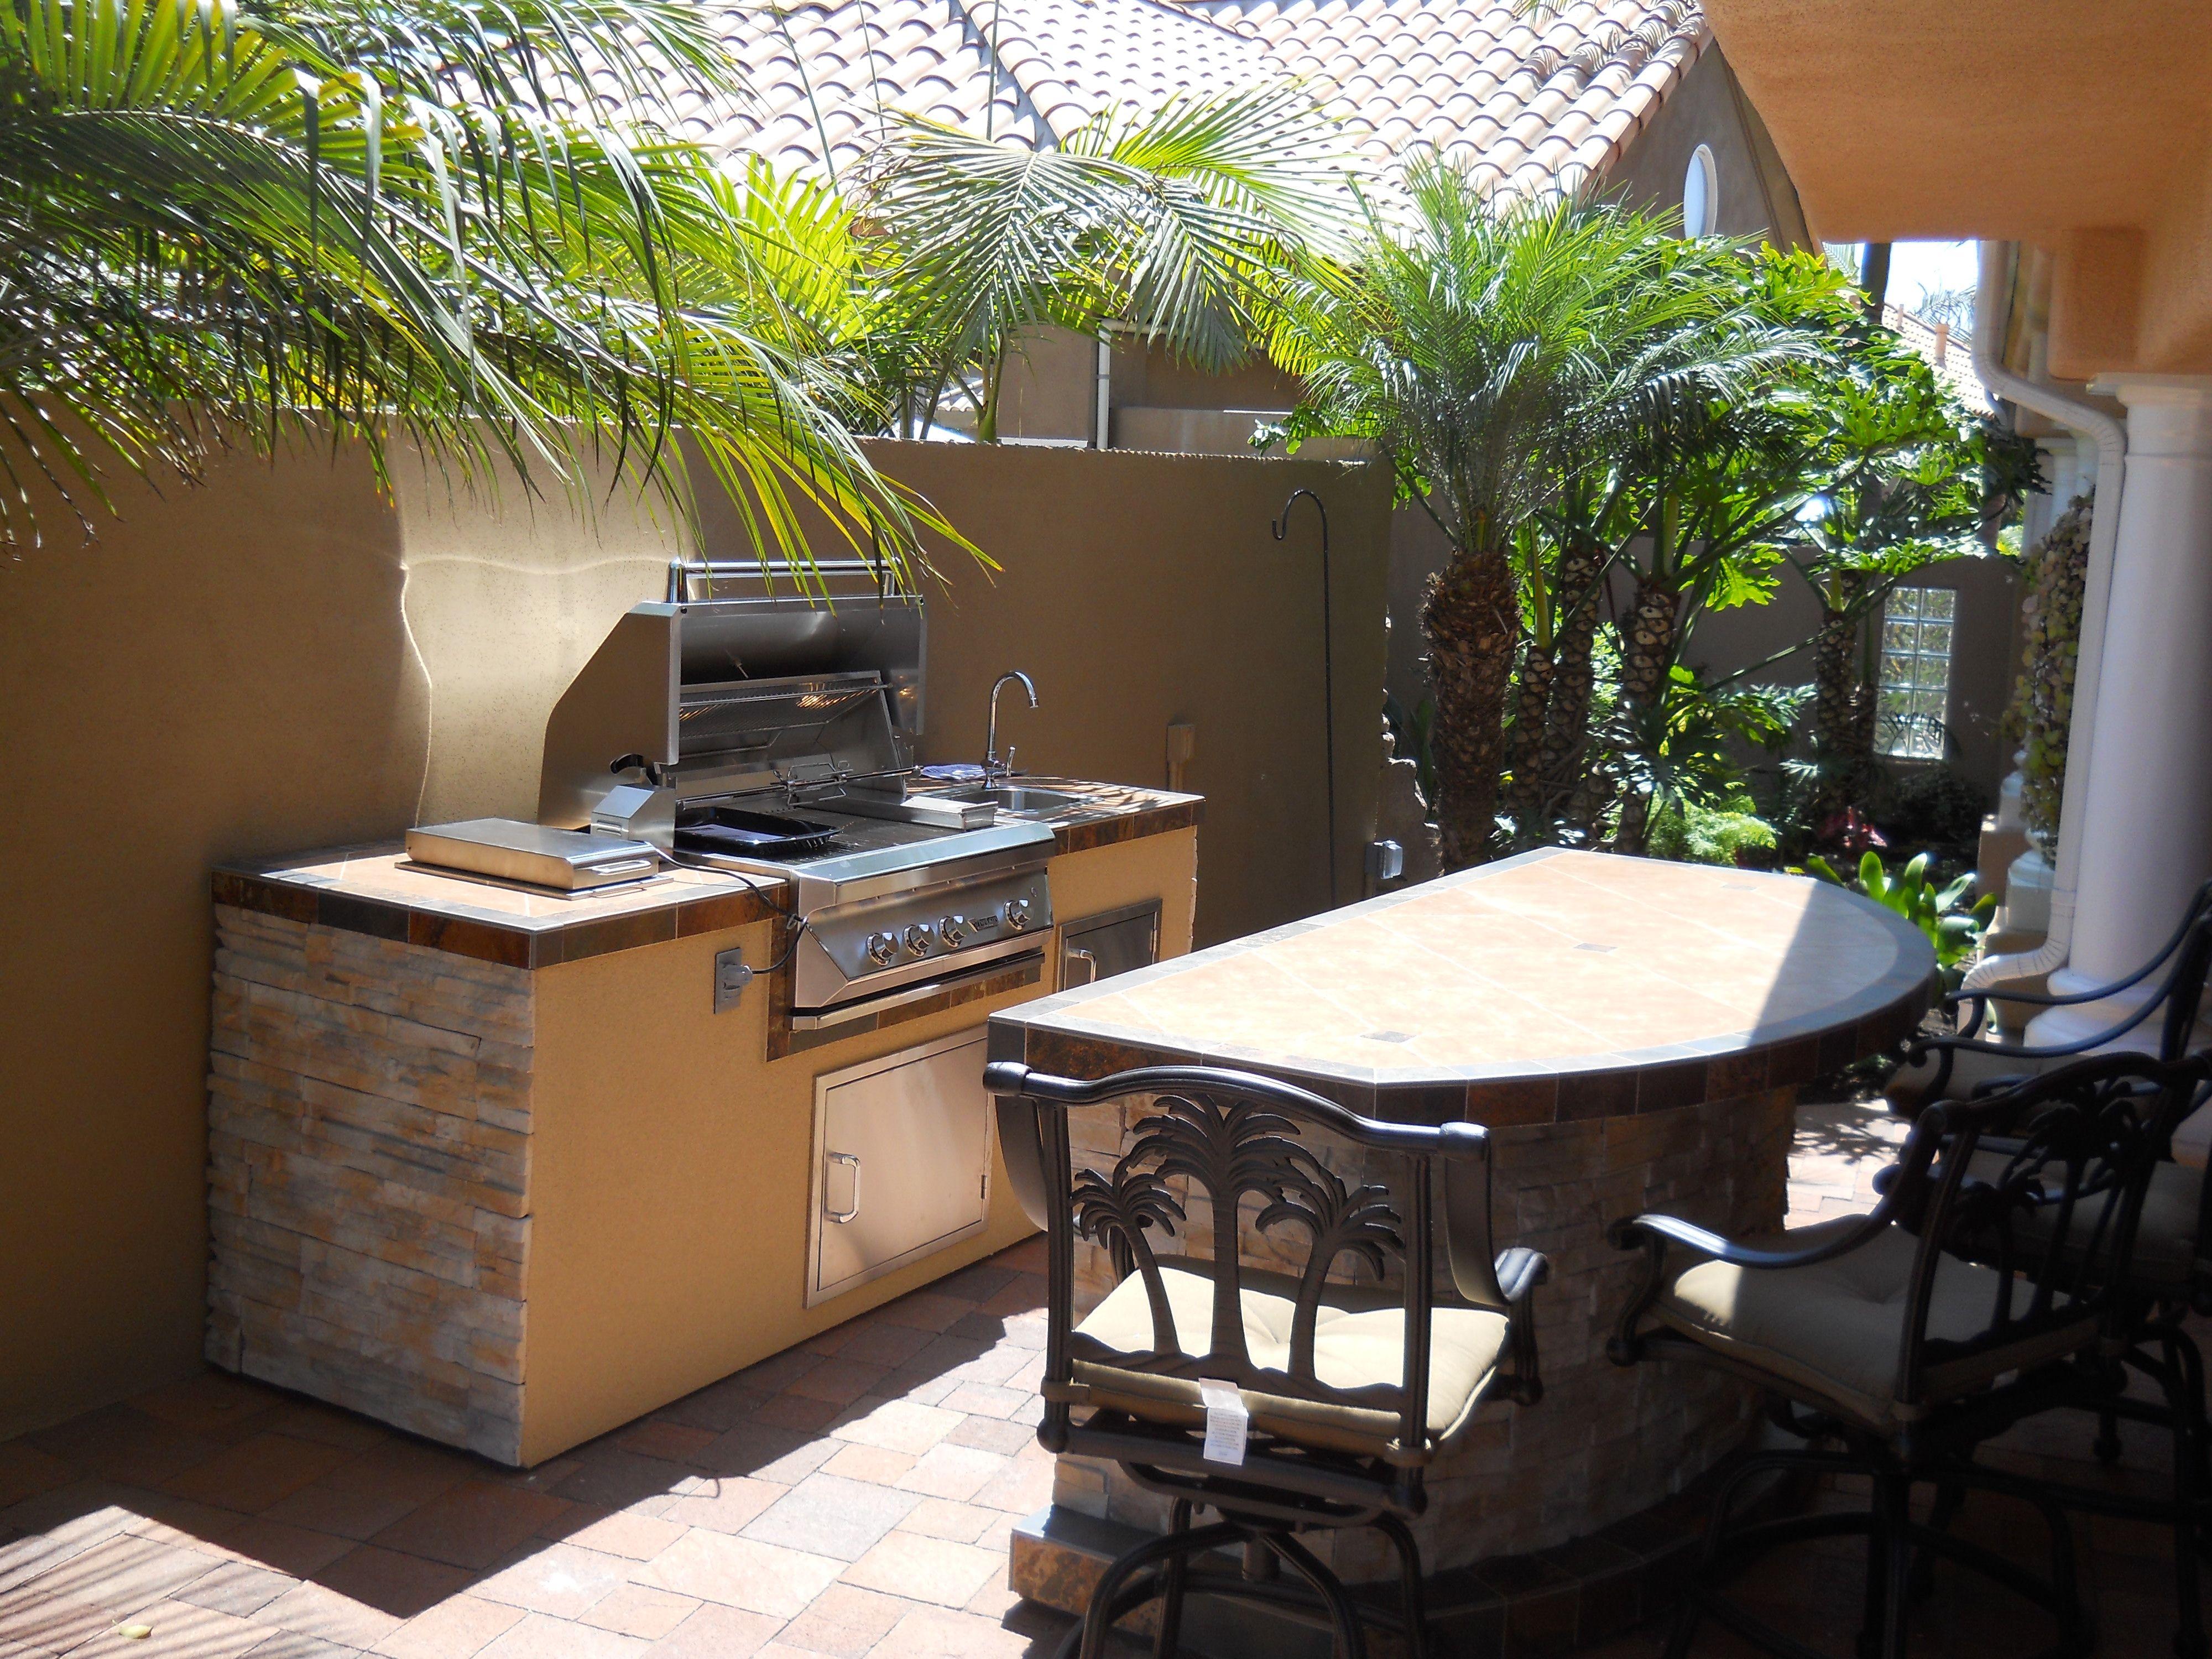 2 Piece BBQ Island - 36 Inch Built In Grill - With Bar ... on Diy Patio Grill Island id=36150